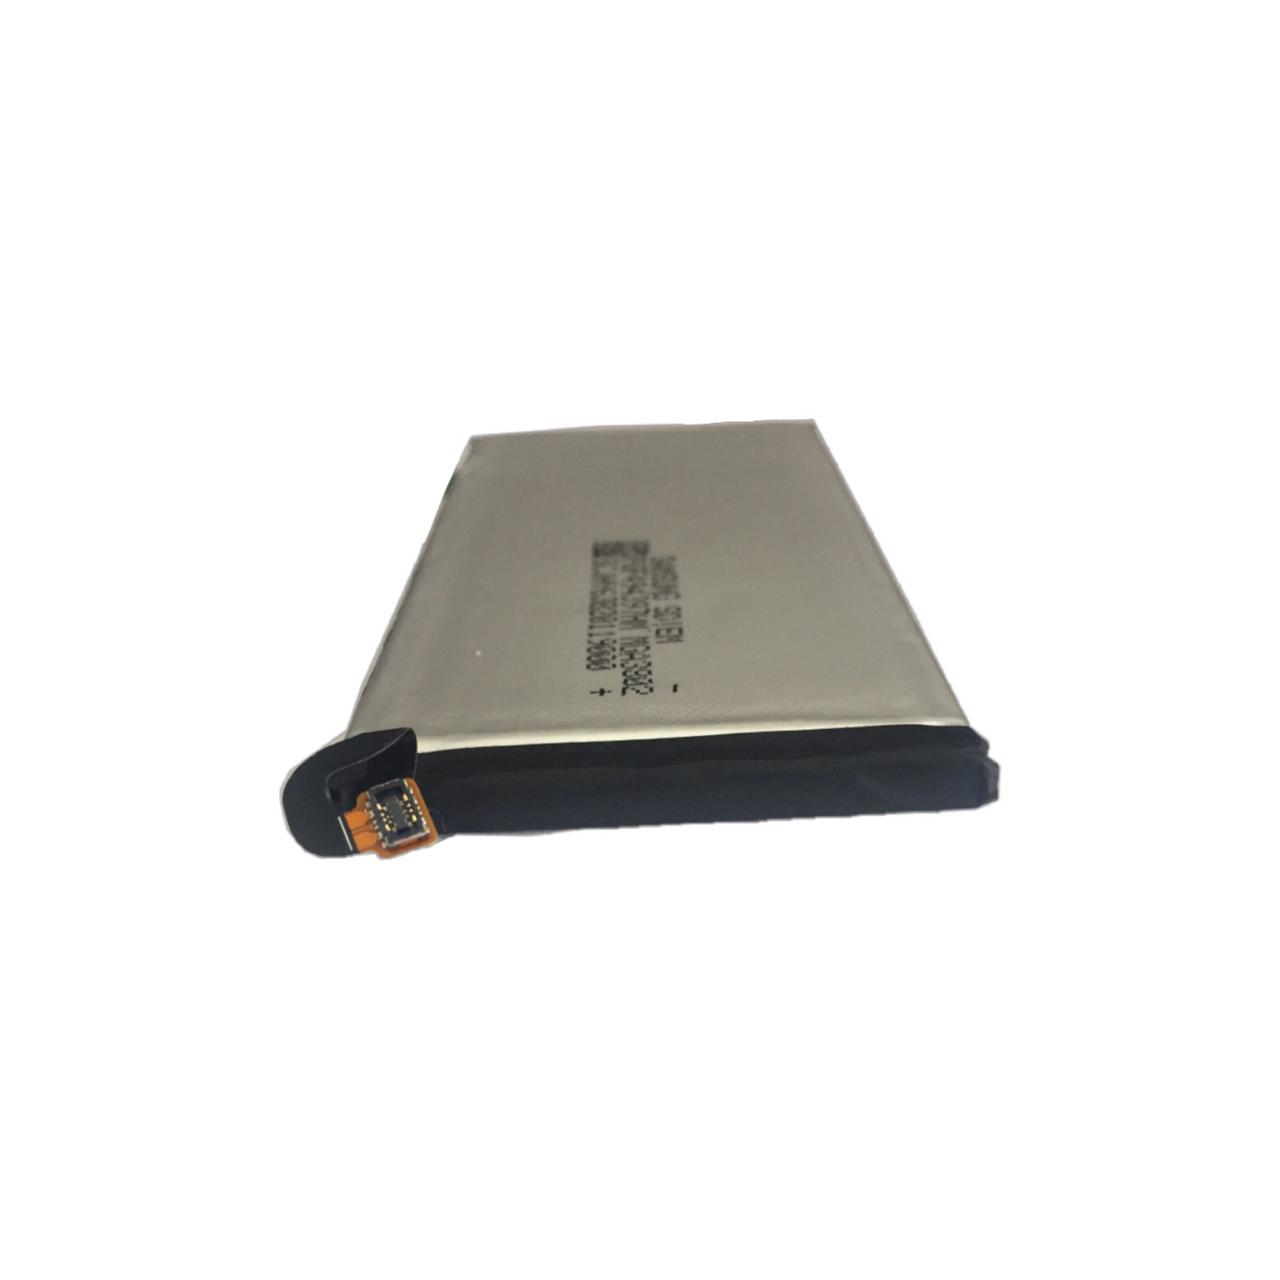 Bateria Samsung Galaxy S7 SM-G935F (gh43-04575b) Original